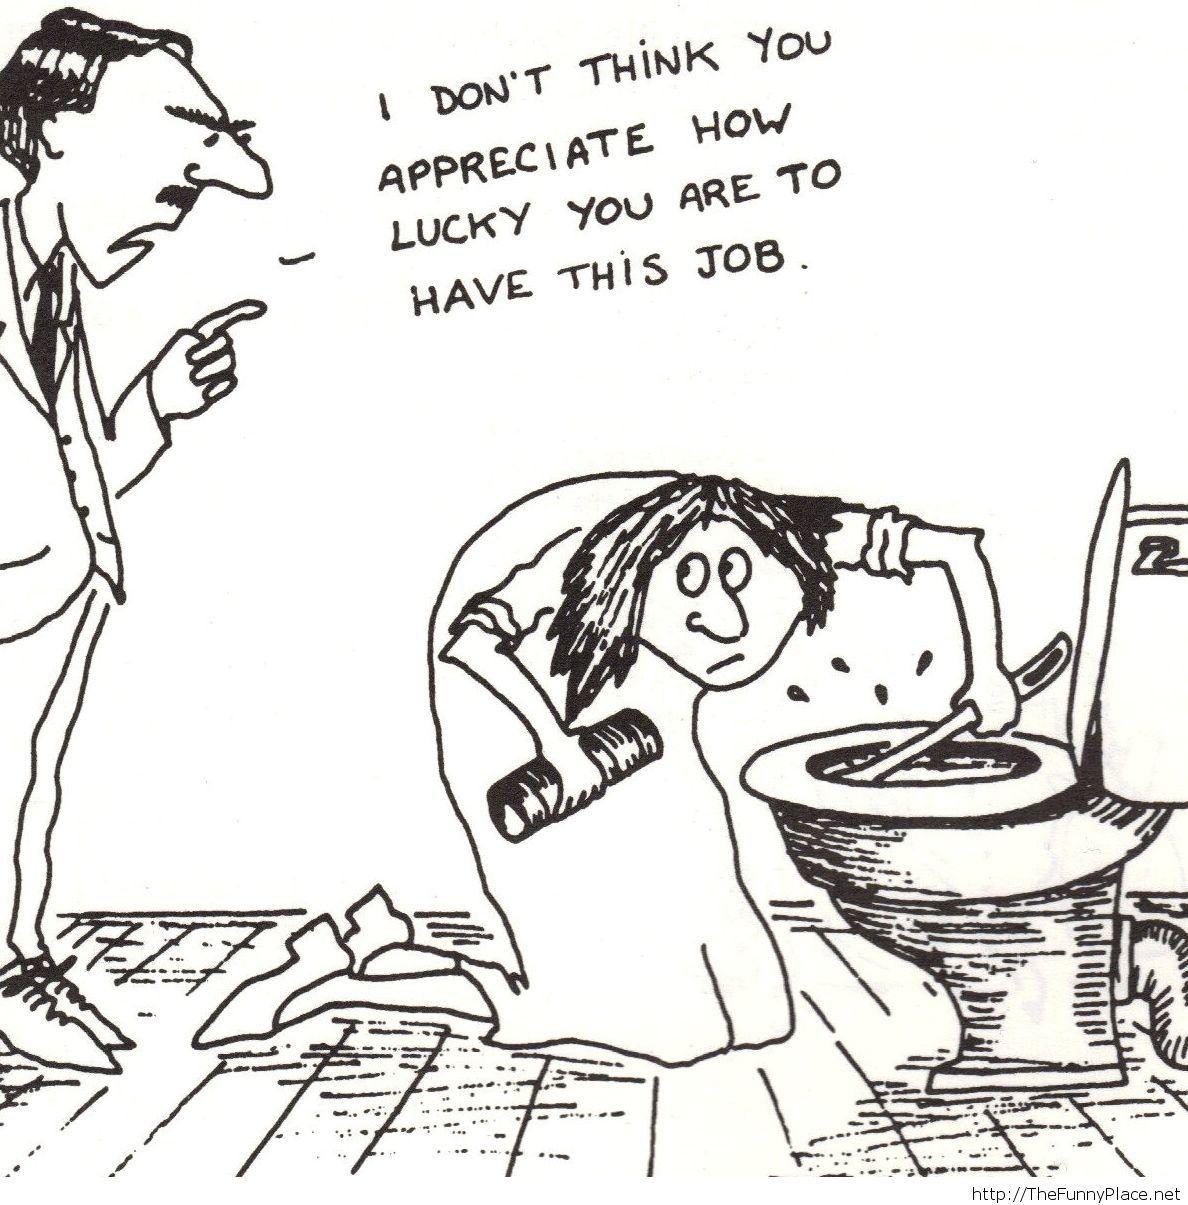 Appreaciate your job